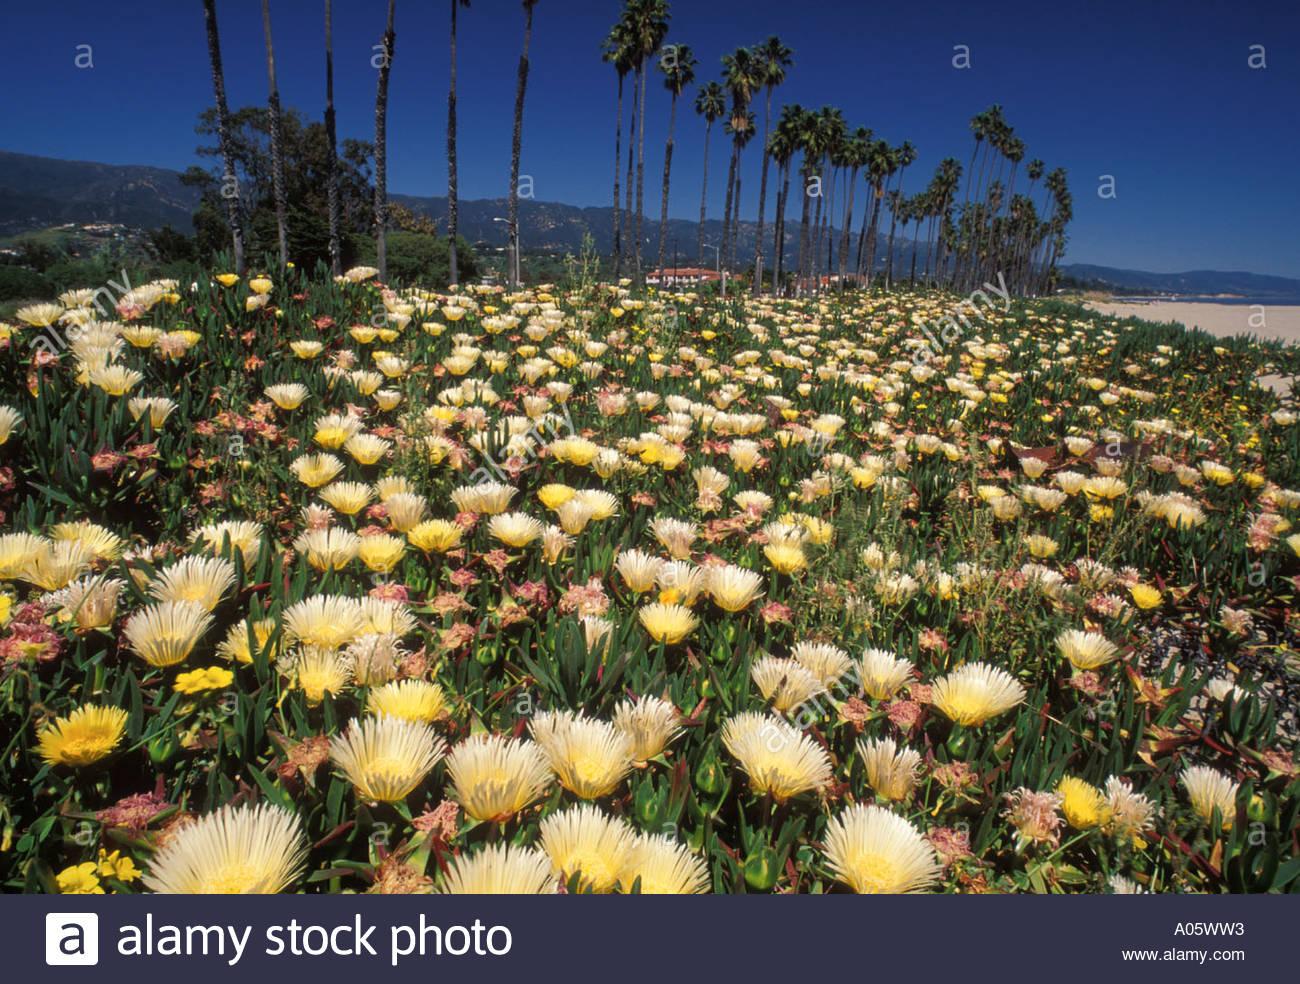 ice-plant-flowers-along-the-beach-in-santa-barbara-california-united-A05WW3